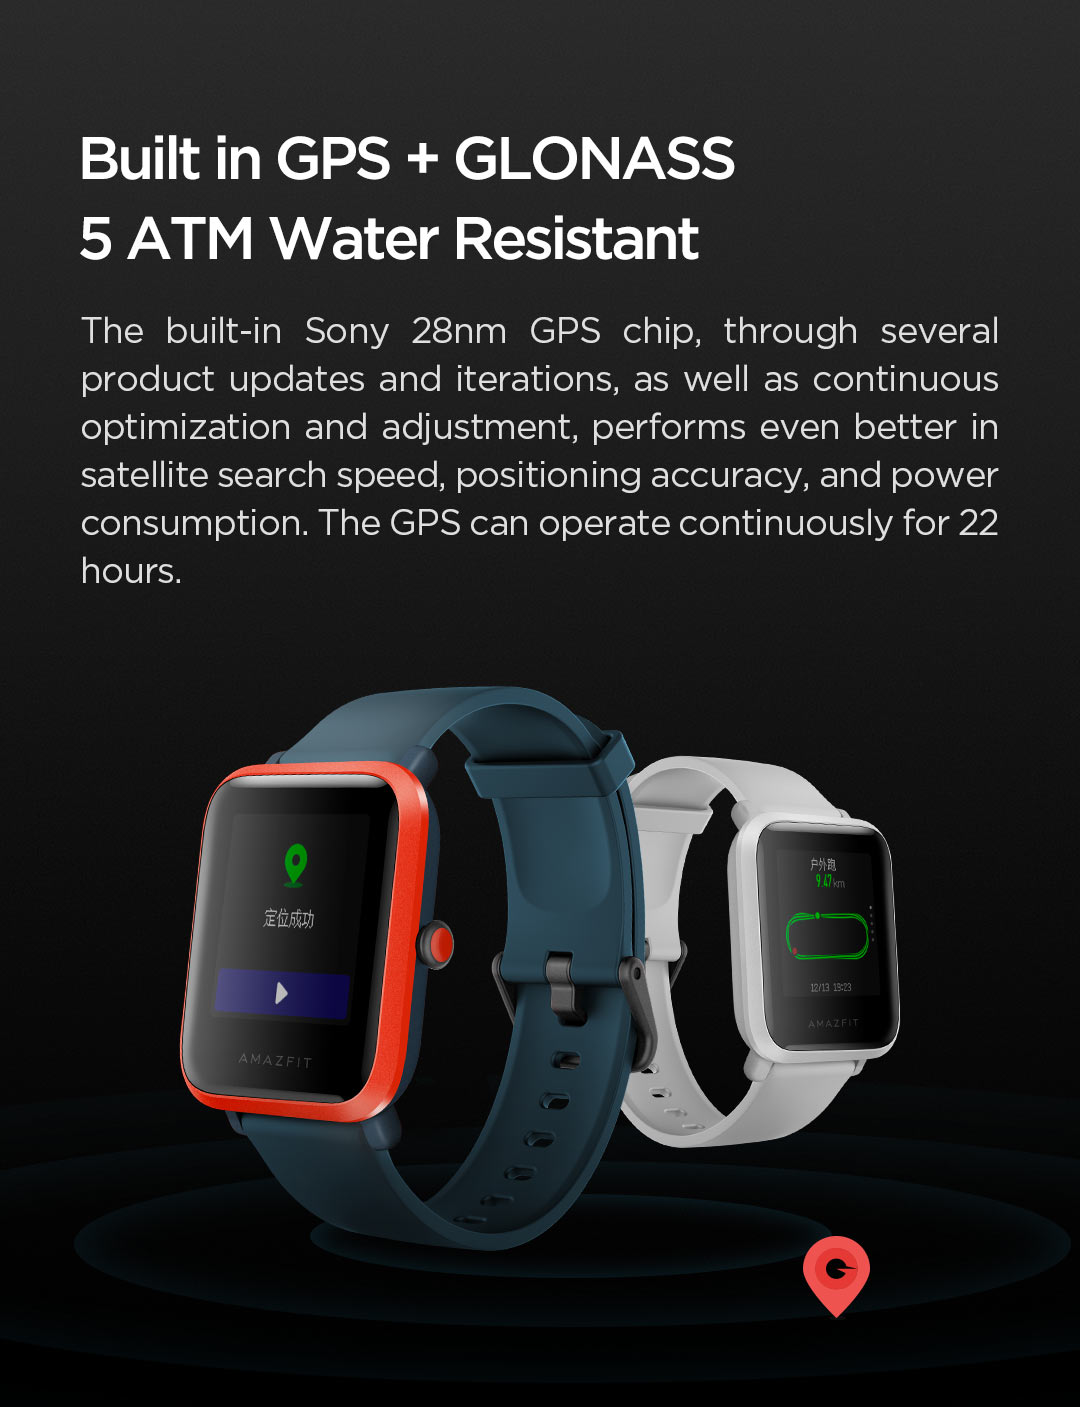 Hca83c8eb222844b2b2cff3f0dee2e21bU In Stock 2020 Global Amazfit Bip S Smartwatch 5ATM waterproof built in GPS GLONASS Smart Watch for Android iOS Phone